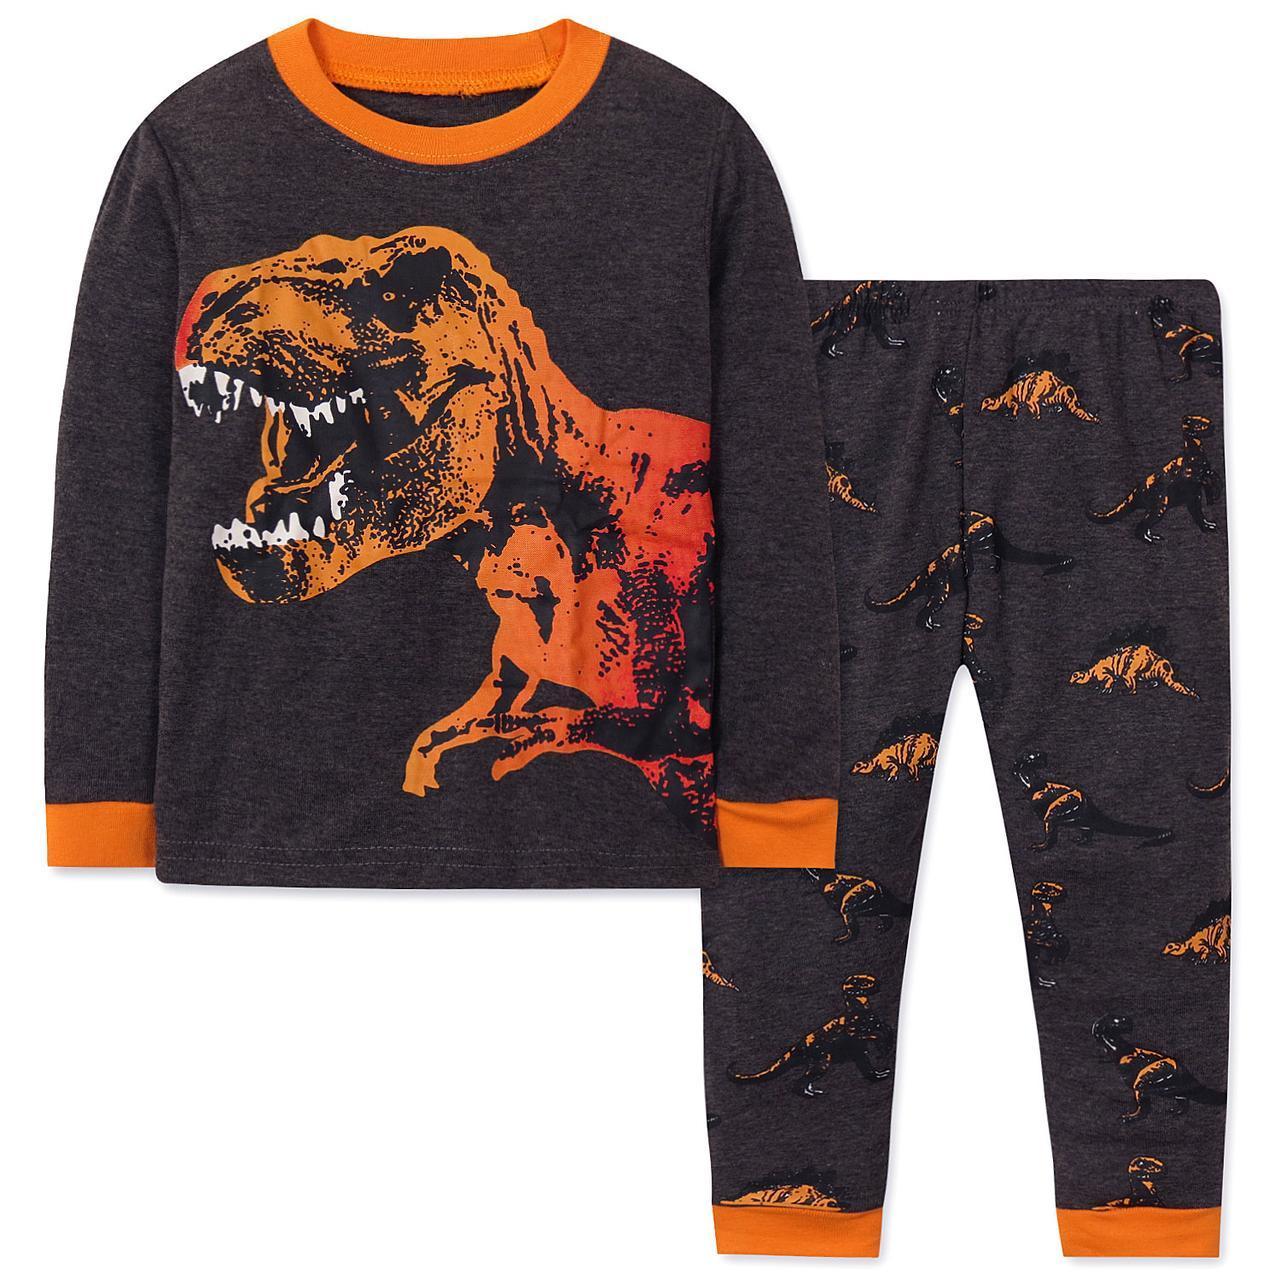 Пижама Динозавр Wibbly pigbaby (90)  продажа f7e2fd88bb9e1